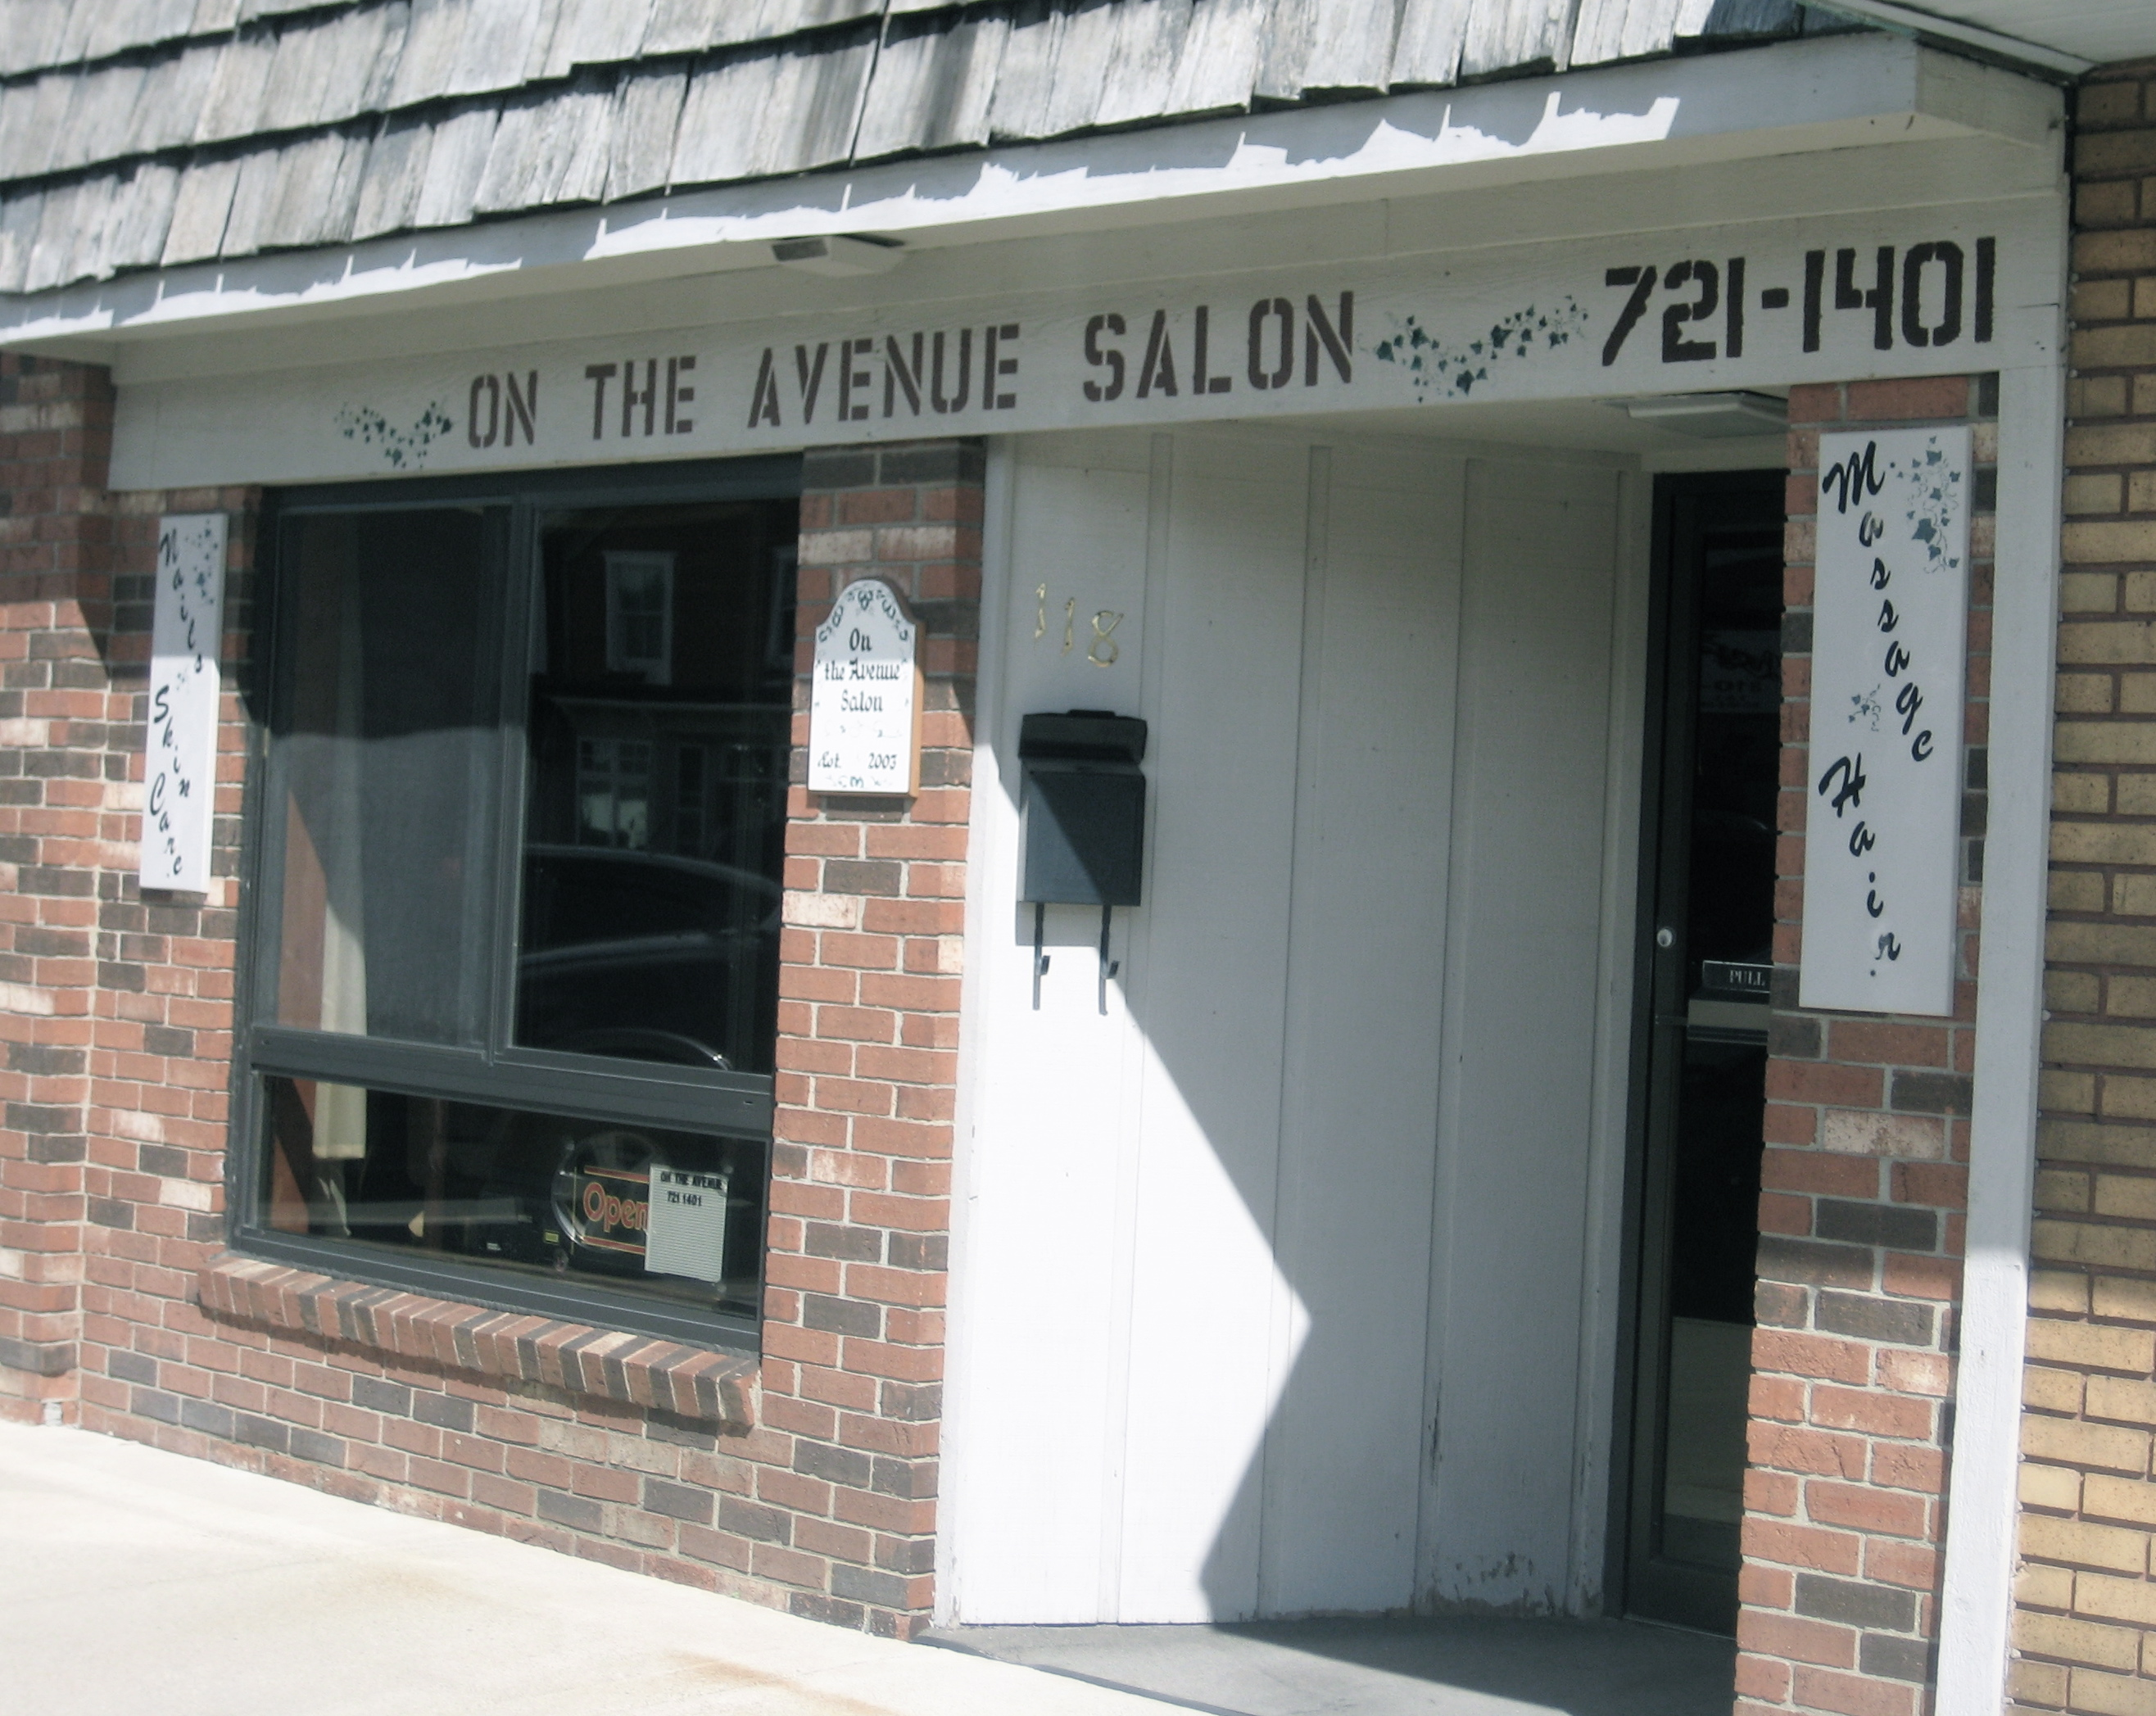 The beauty salons and barber shops of main street usa for Beauty salon usa